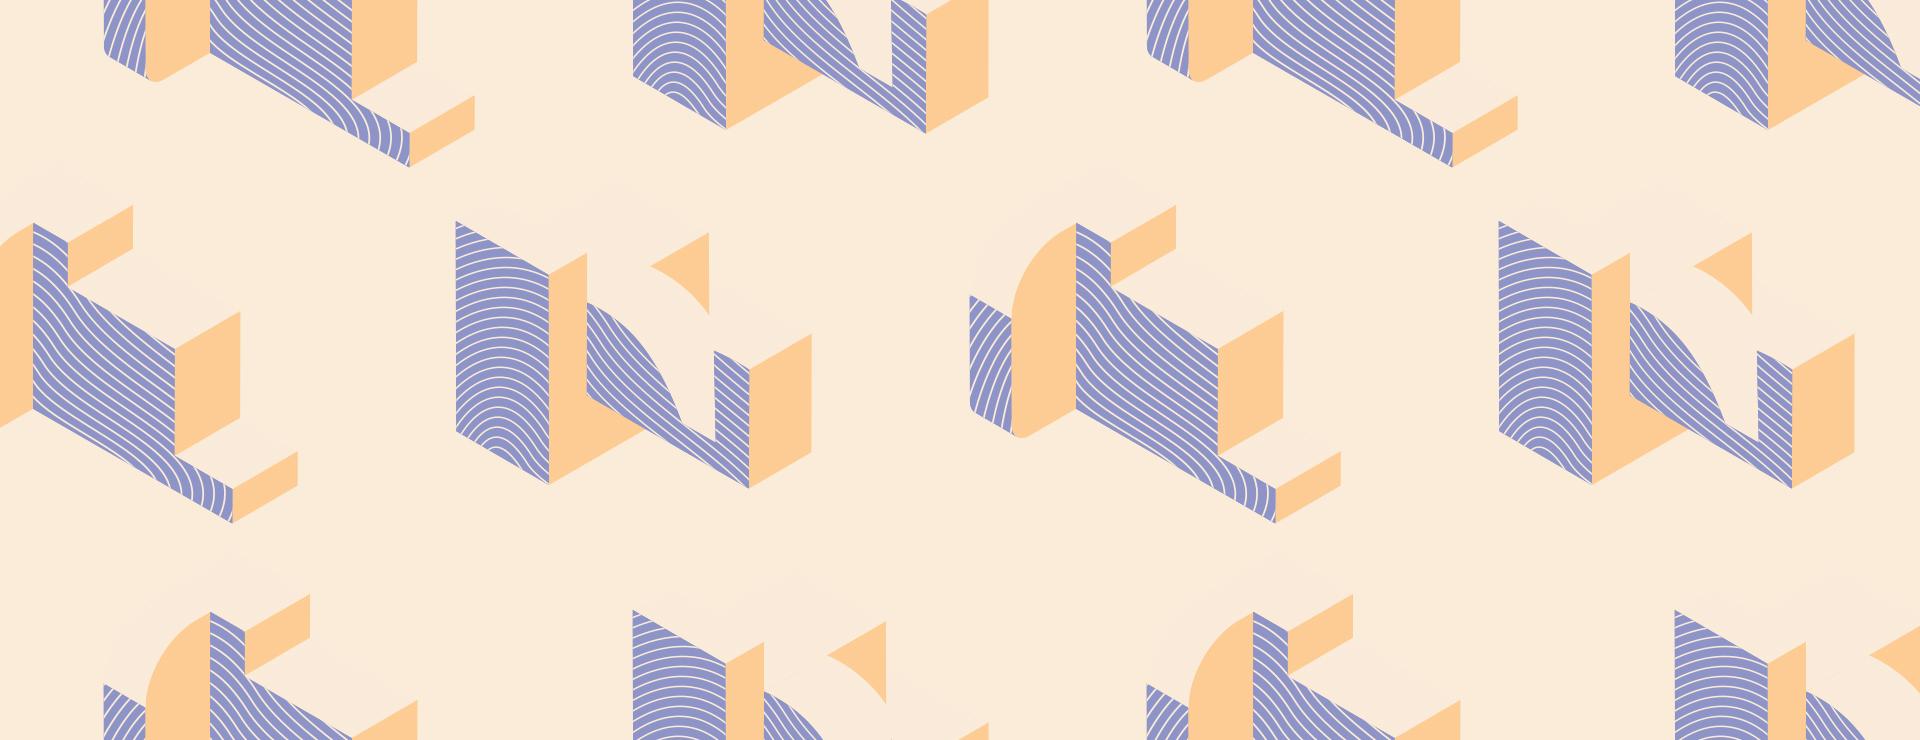 DesignTO Talks: Anony & Castor